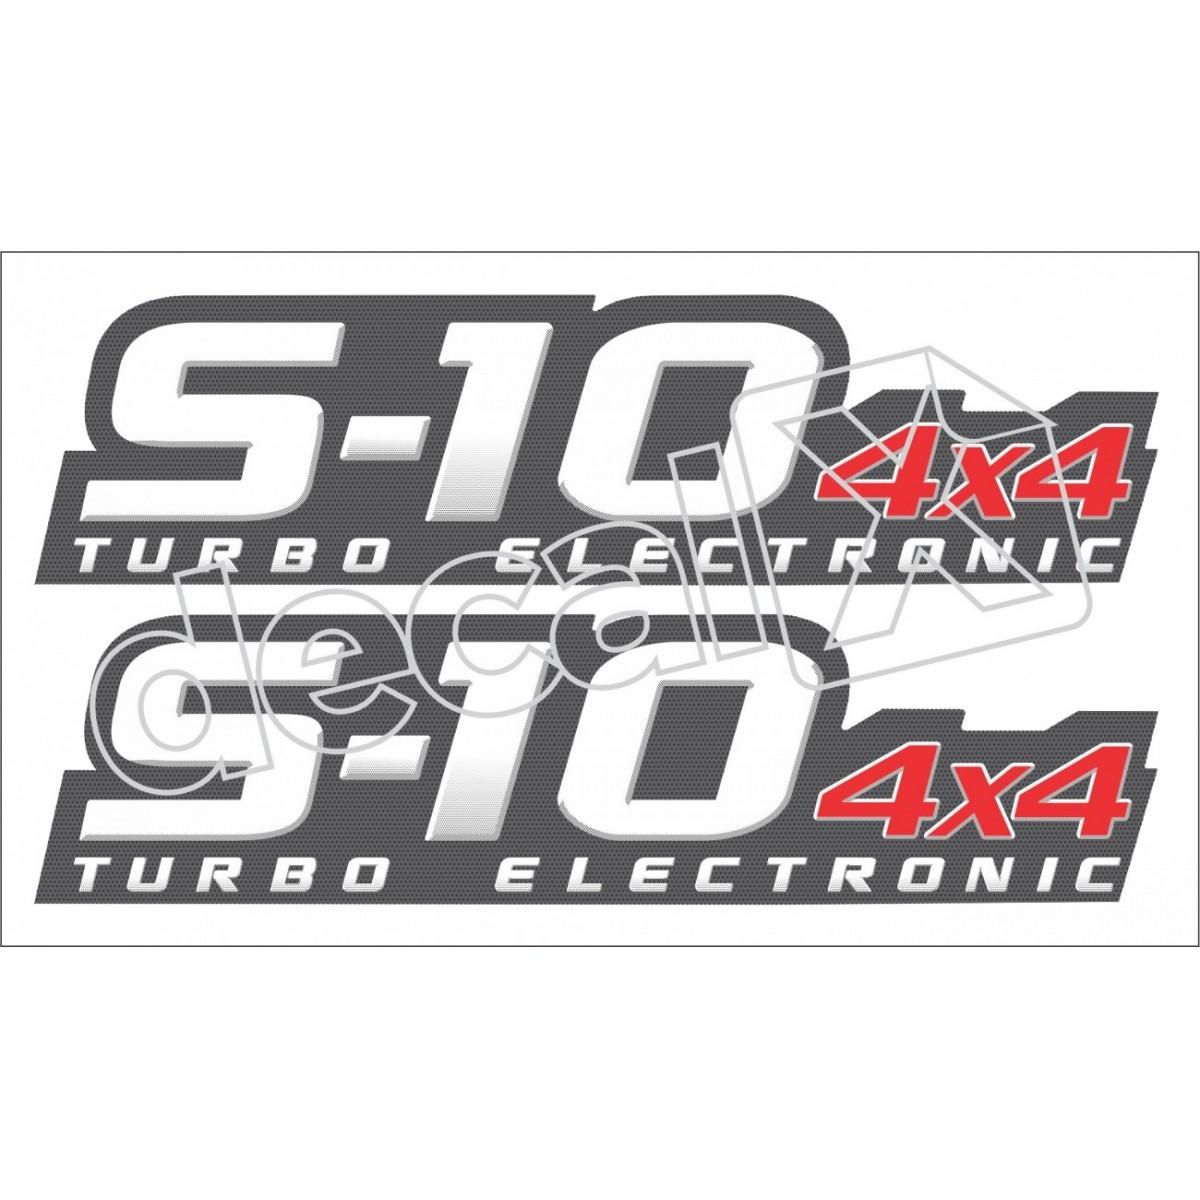 Adesivo Chevrolet S10 4x4 Tubo Eletronic 2009 A 2011 S10003